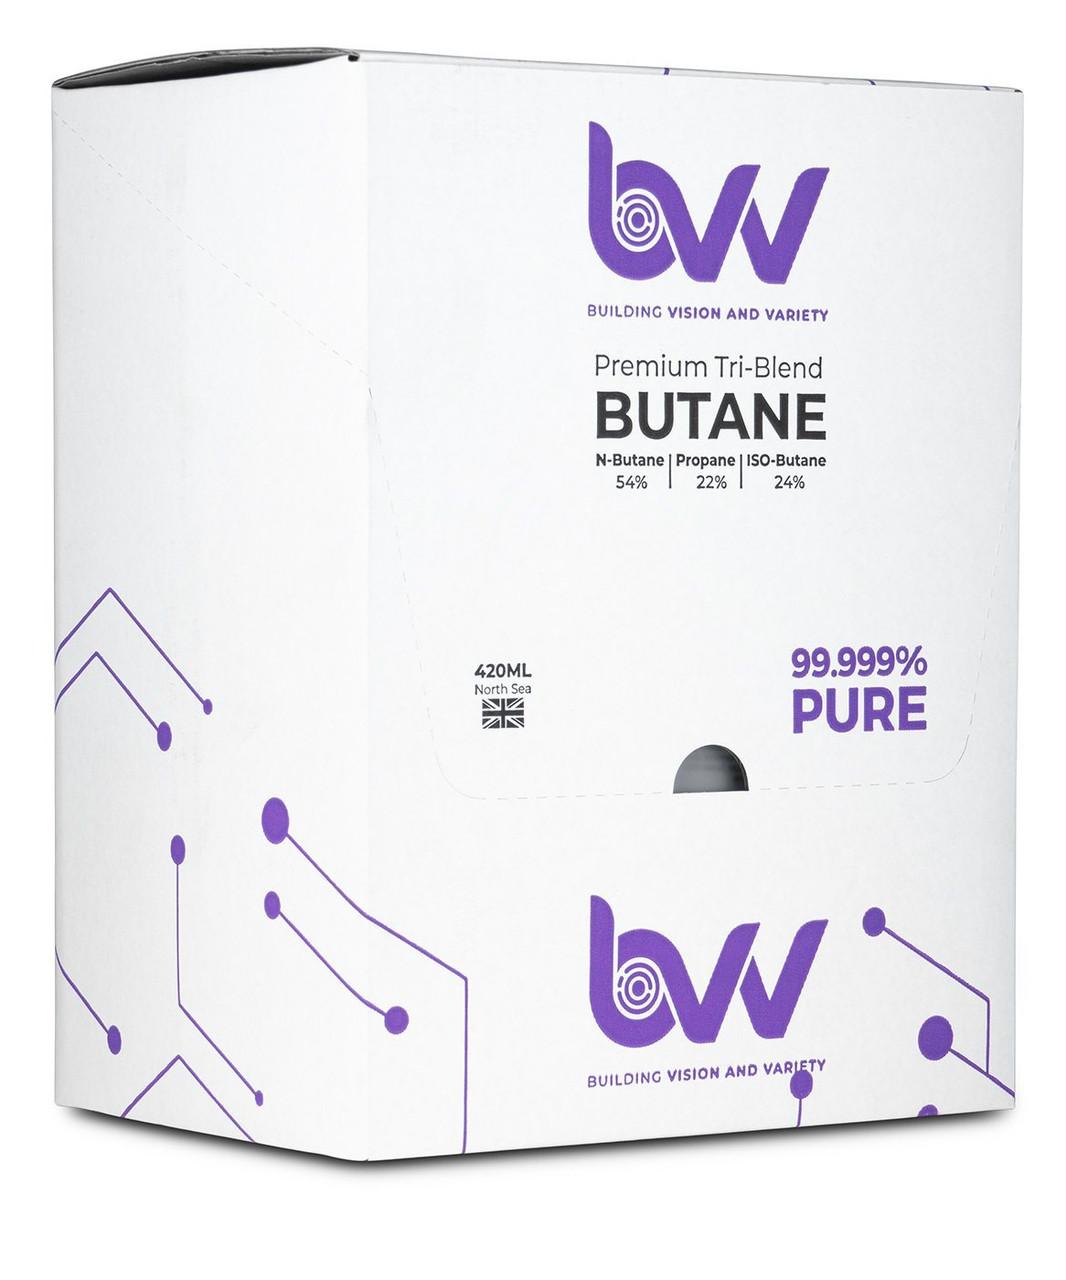 BVV Premium Tri-Blend Butane 99.999% Pure